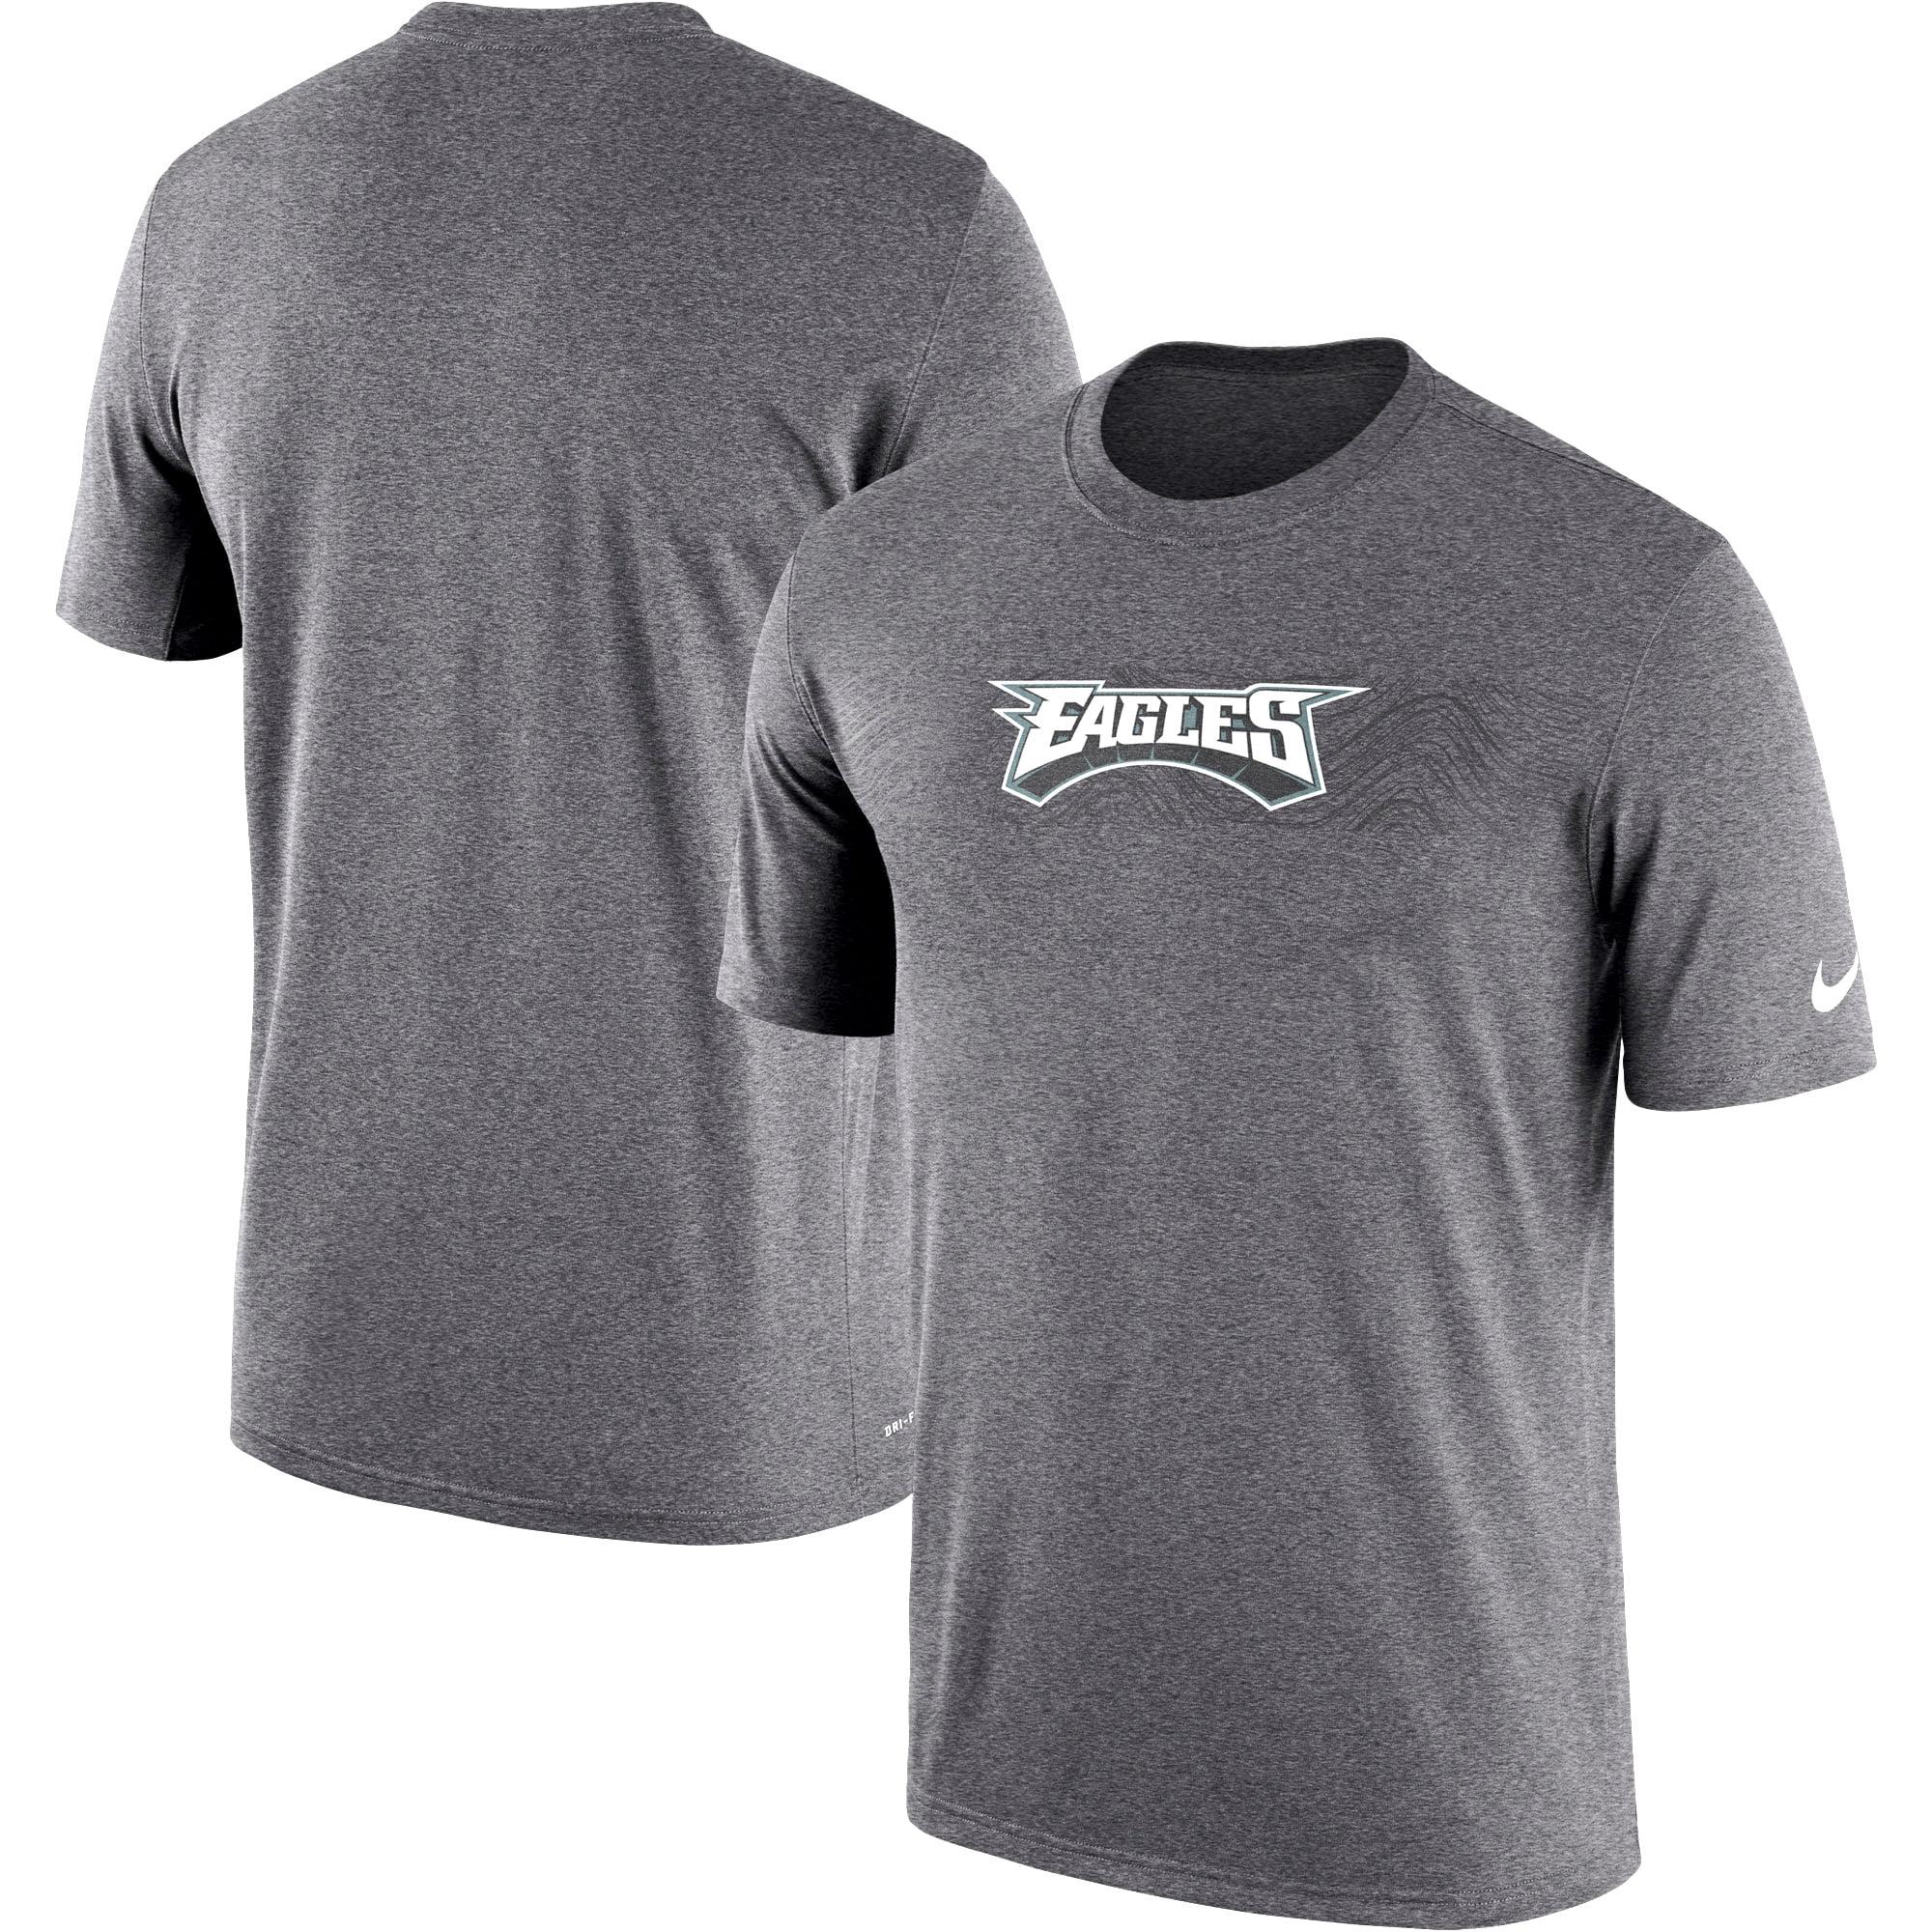 Philadelphia Eagles Nike Sideline Seismic Legend Performance T-Shirt - Heathered Charcoal